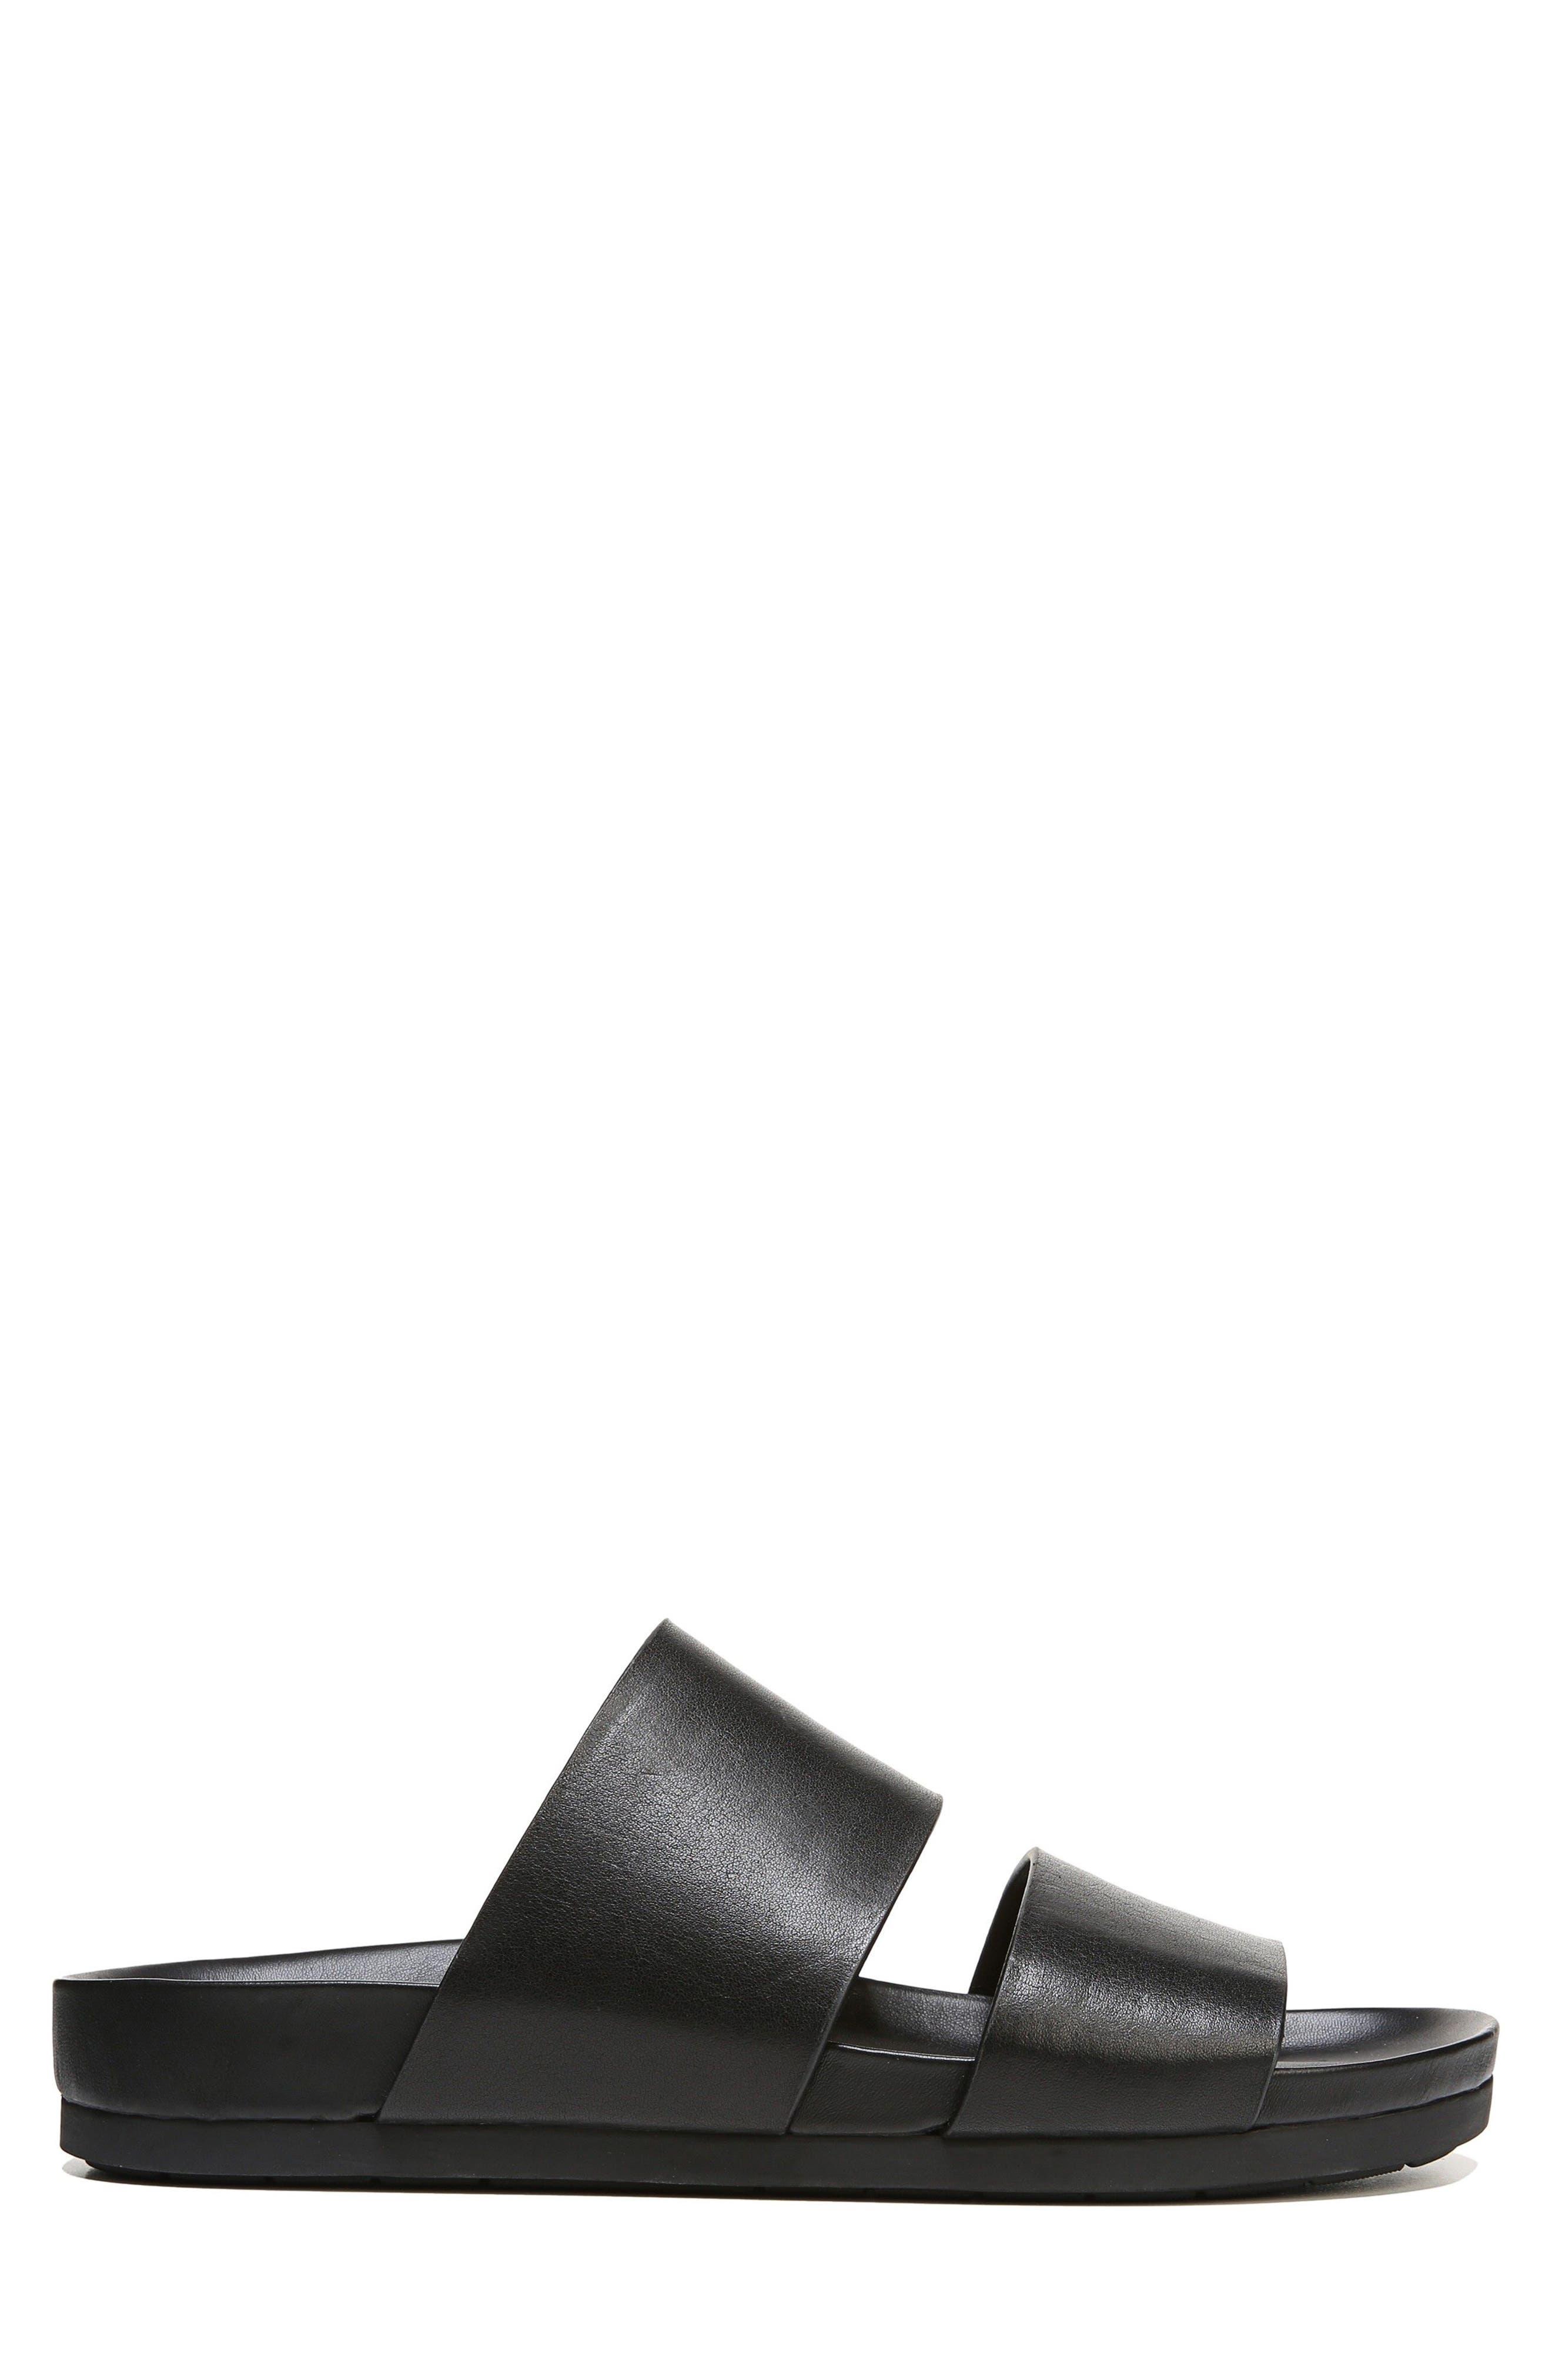 Malibu Slide Sandal,                             Alternate thumbnail 3, color,                             Black